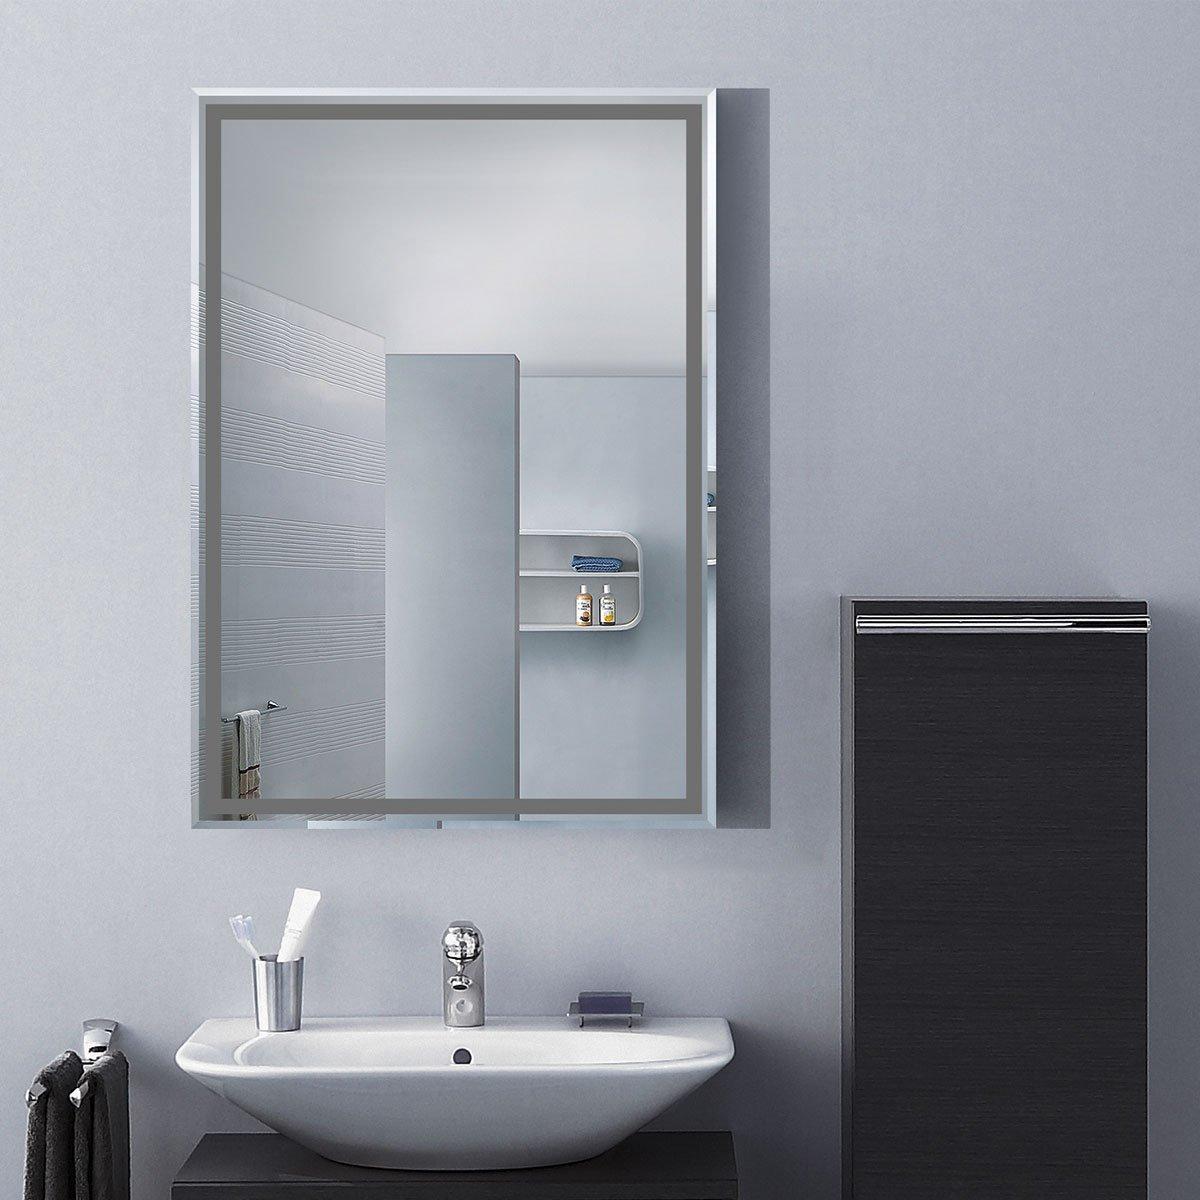 DECORAPORT 28''20'' Frameless Wall-mounted Bathroom Silvered Mirror Rectangle Vertical Vanity Mirror (A-C226B)